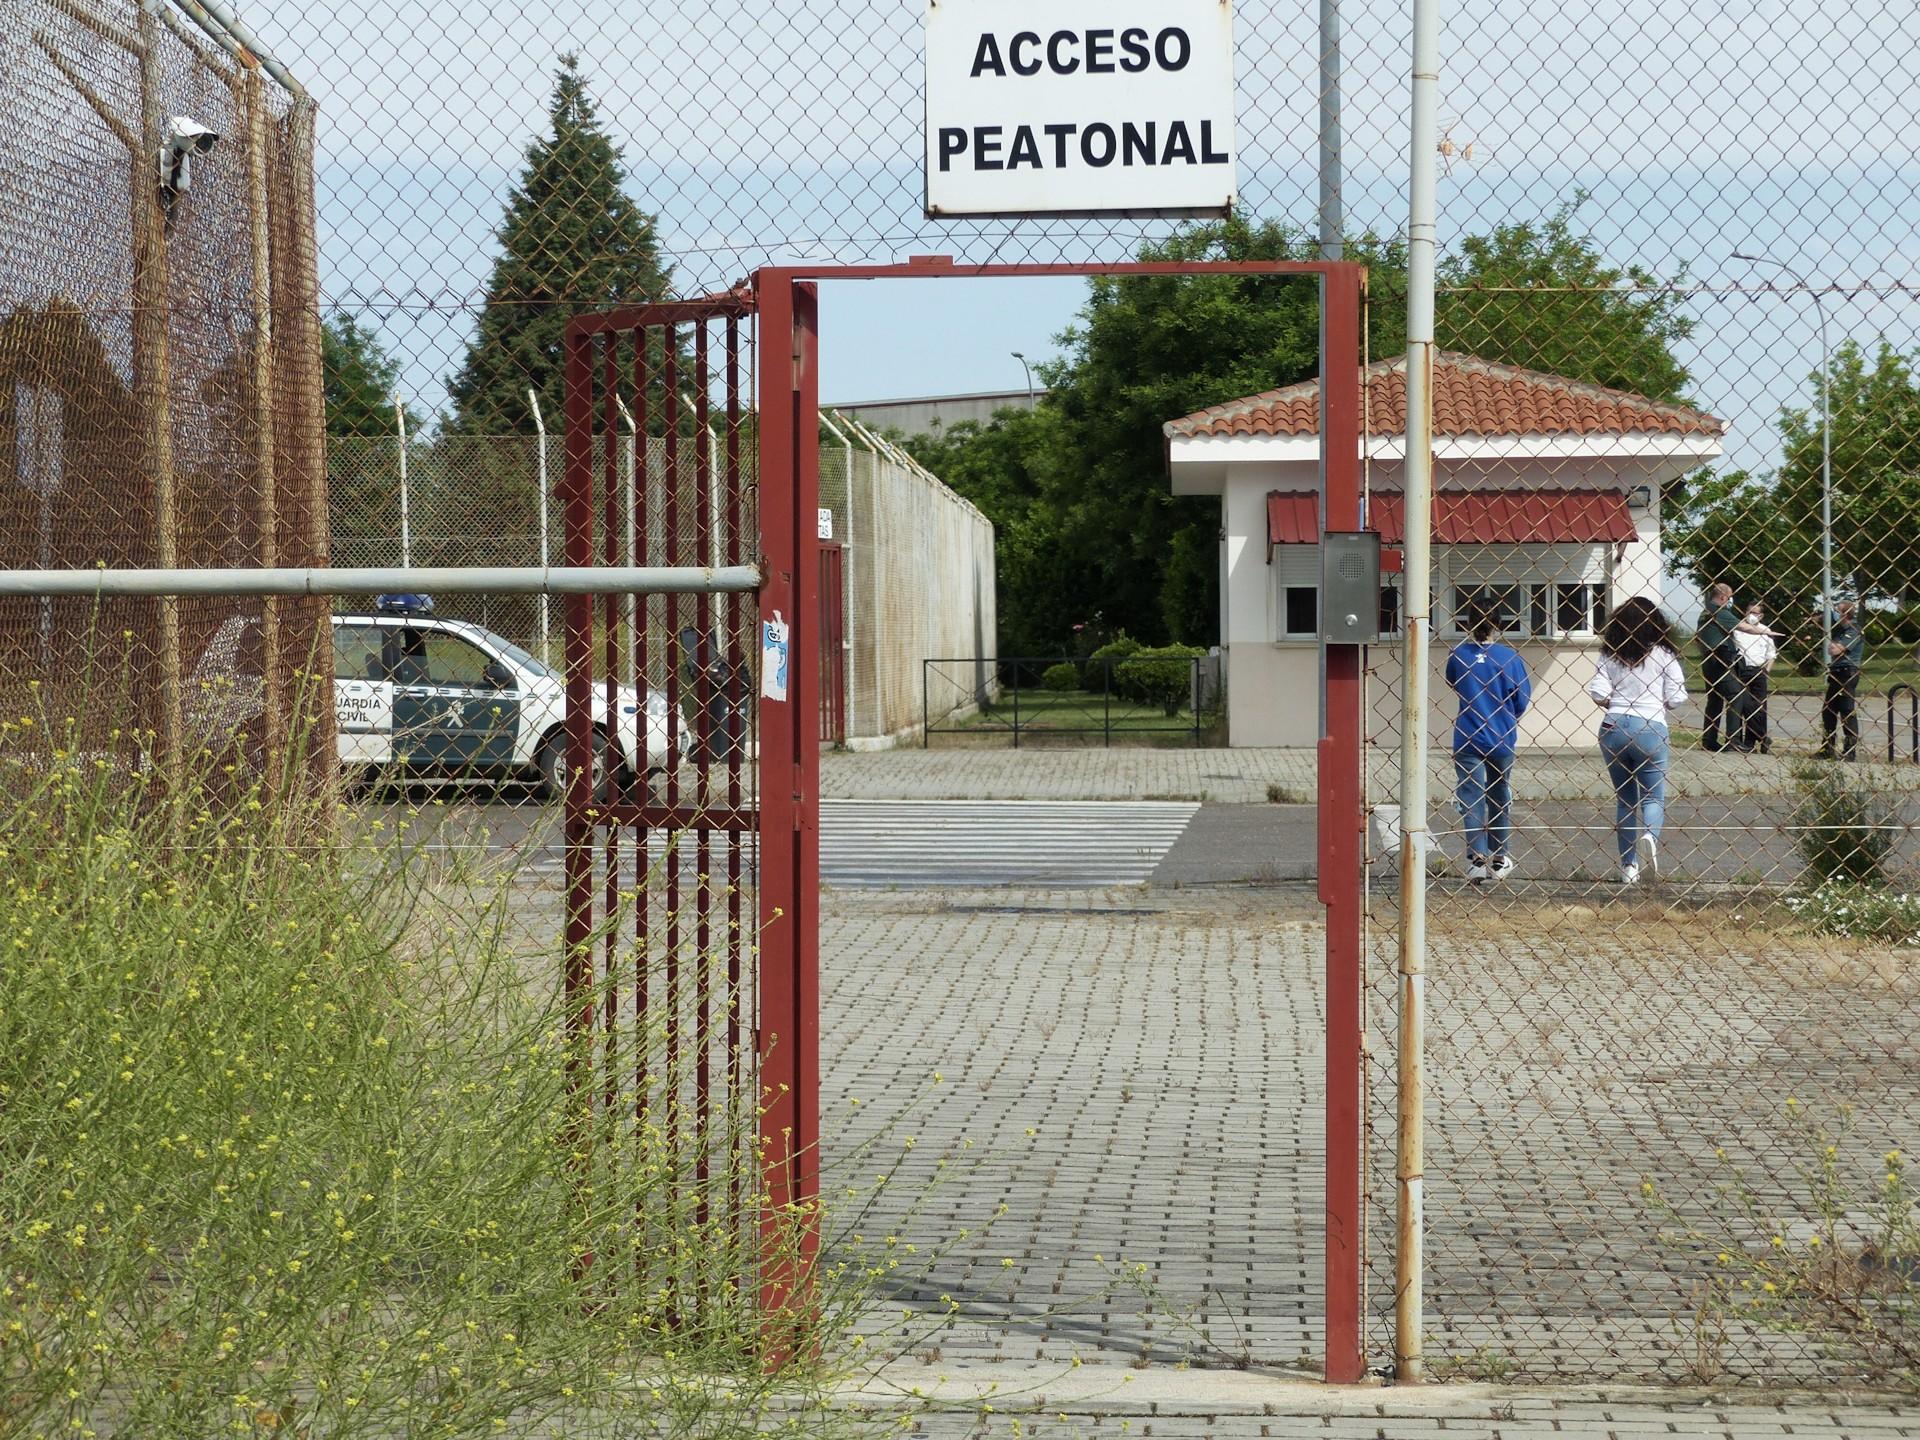 reportaje-prisiones-acceso-carcel-valdemoro-030620.jpg